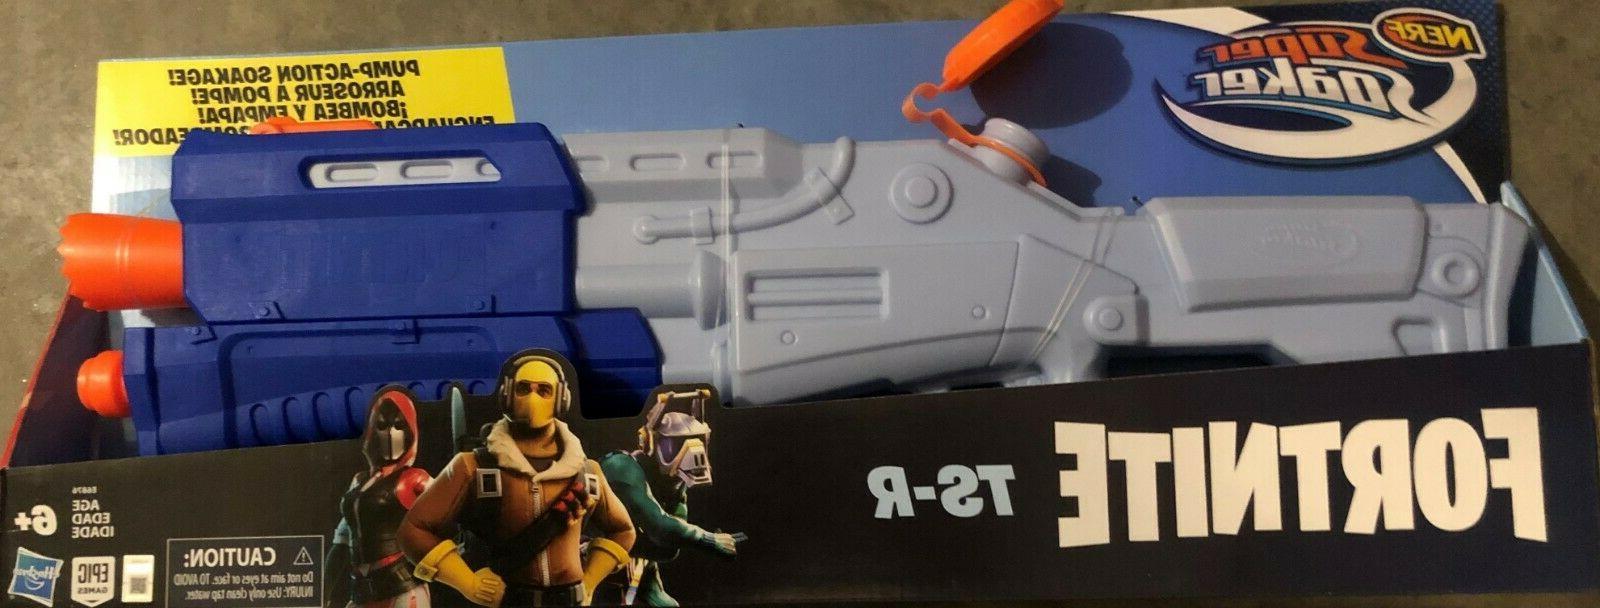 NERF SUPER Fortnite Blasters, Water Guns, and